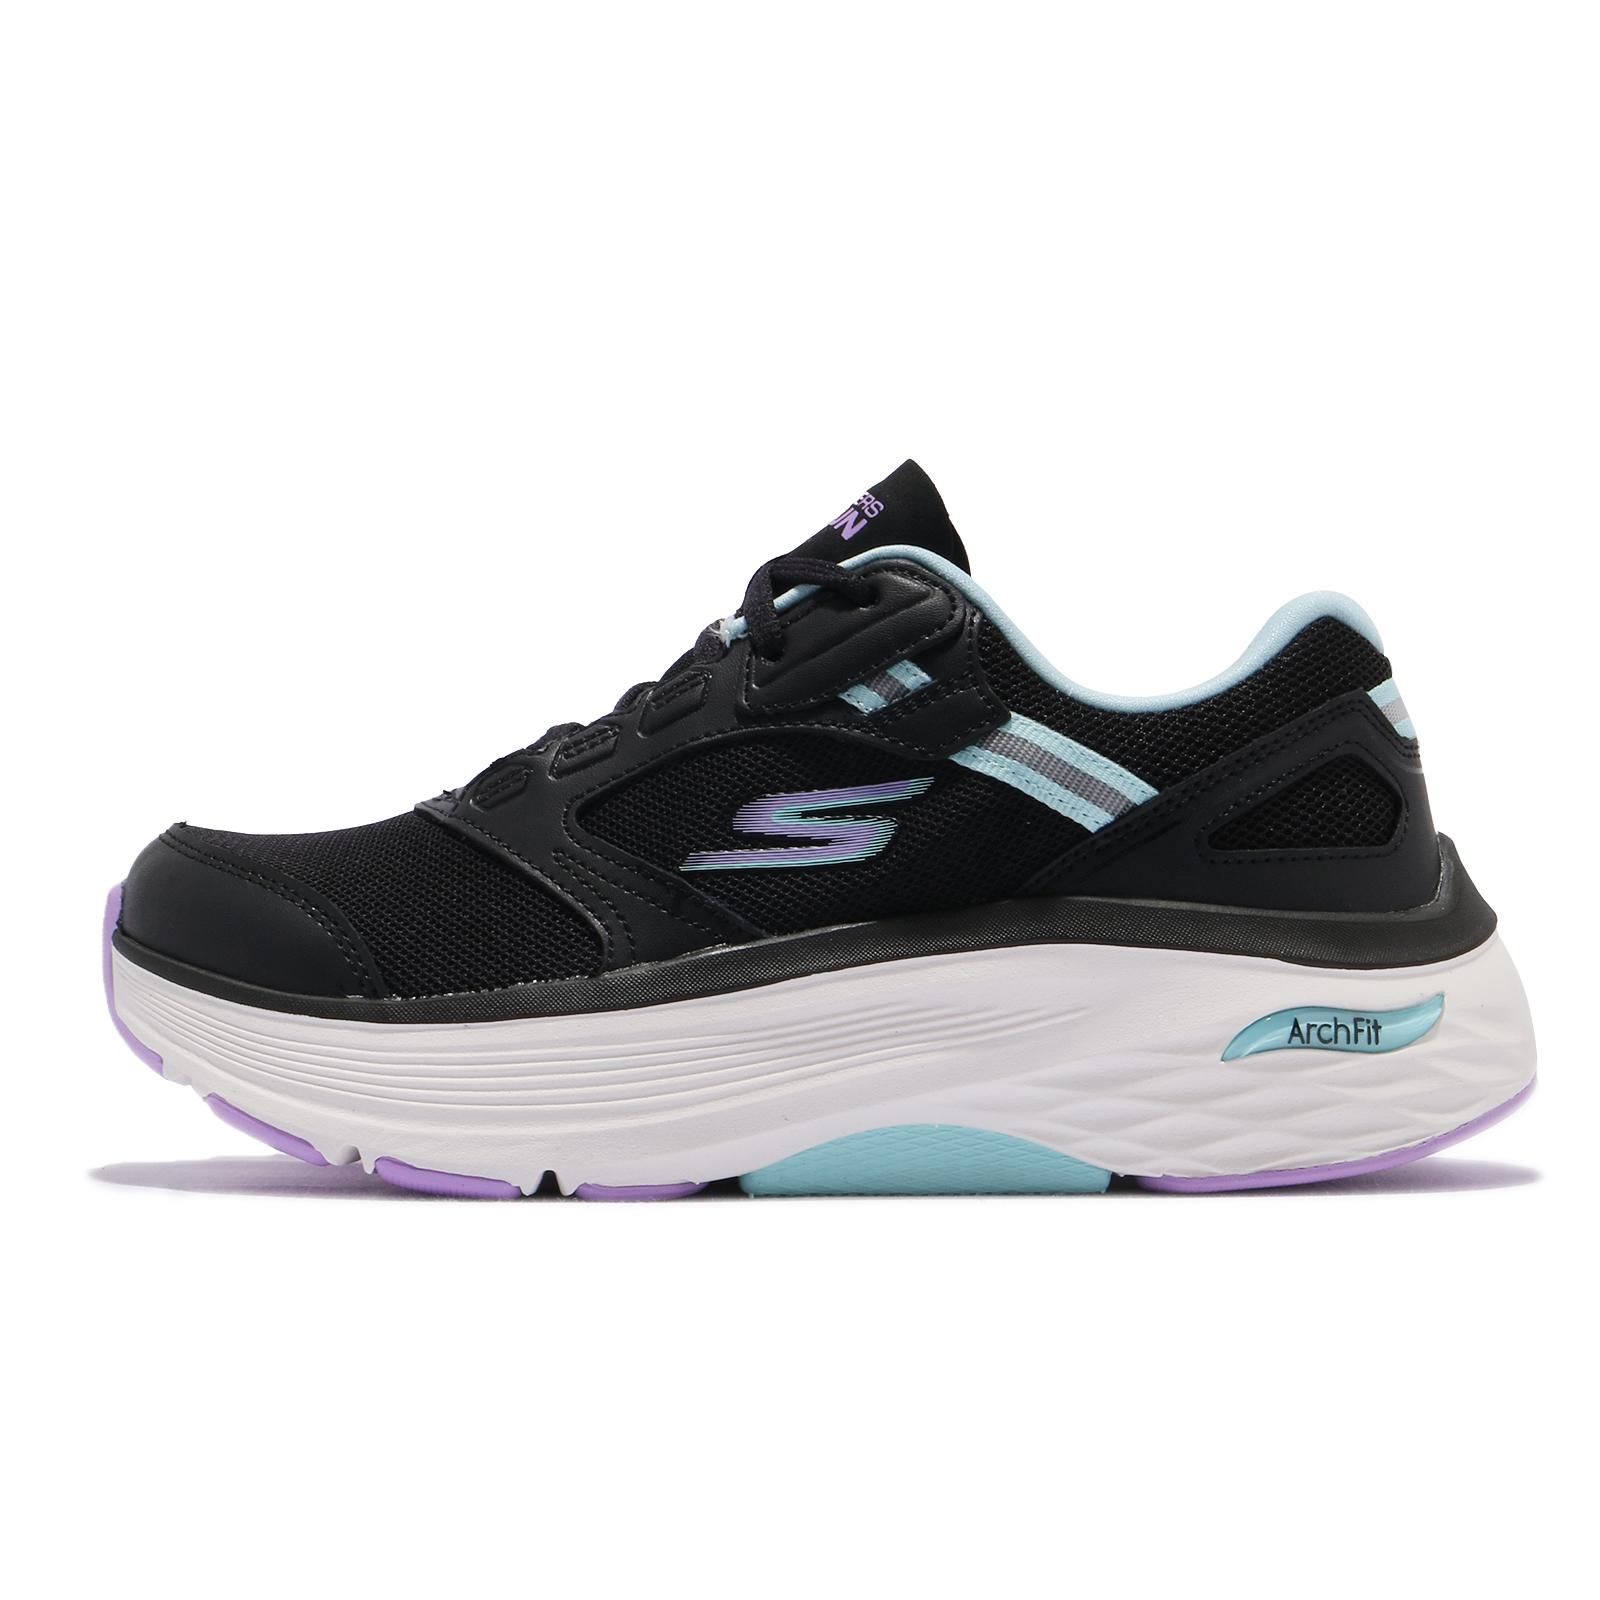 Skechers 健走鞋 Max Cushioning Arch Fit 女 黑 紫 【ACS】 128301-BKAQ